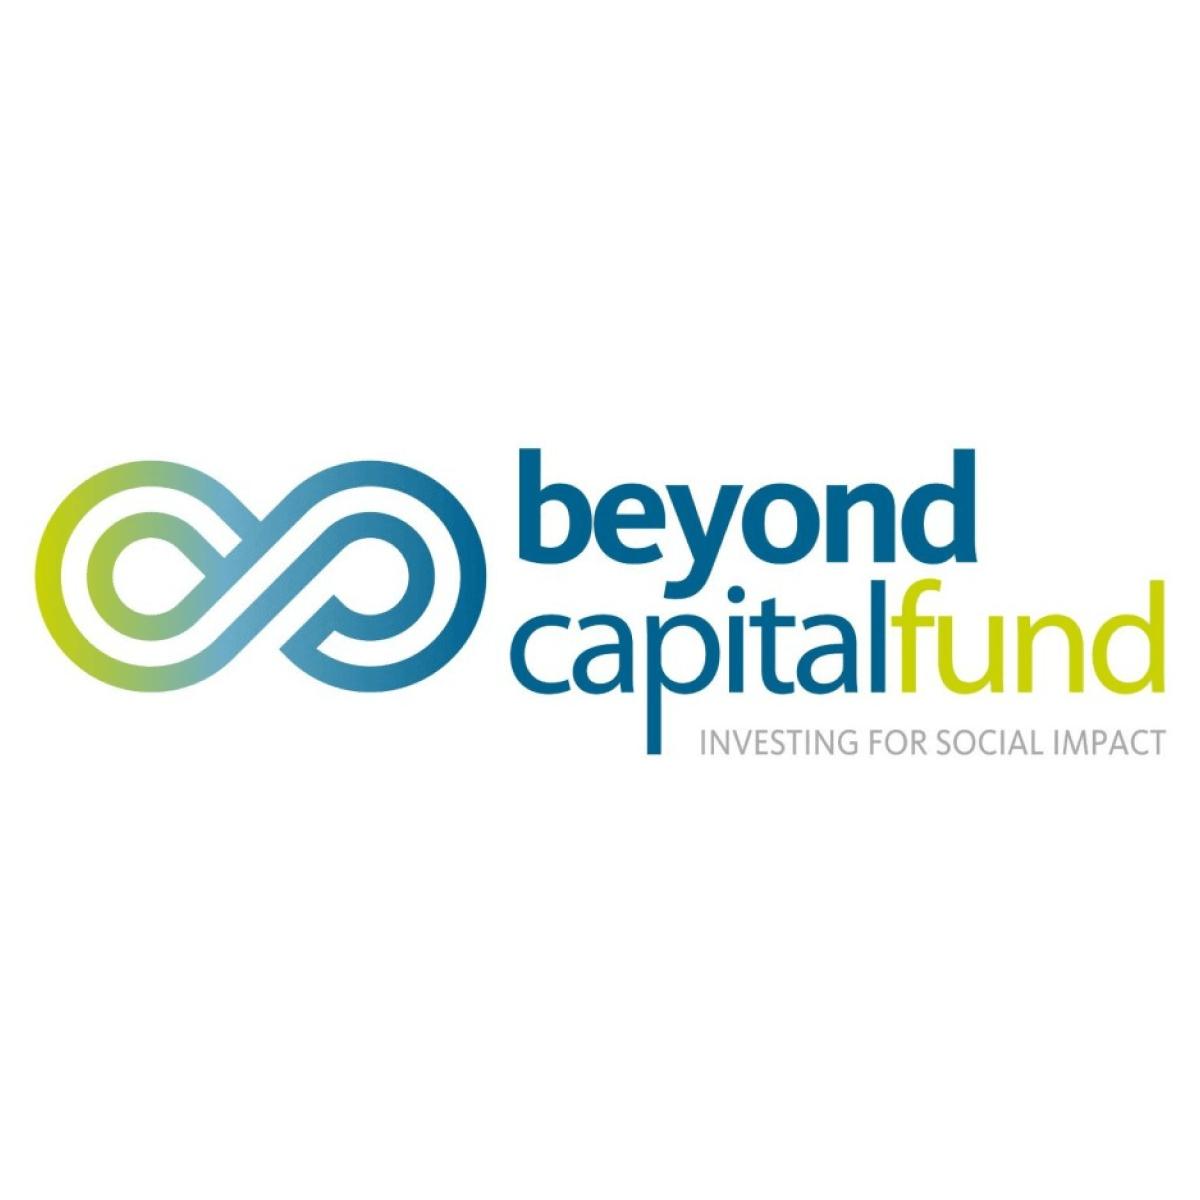 Beyond Capital Fund Beyond Capital Fund